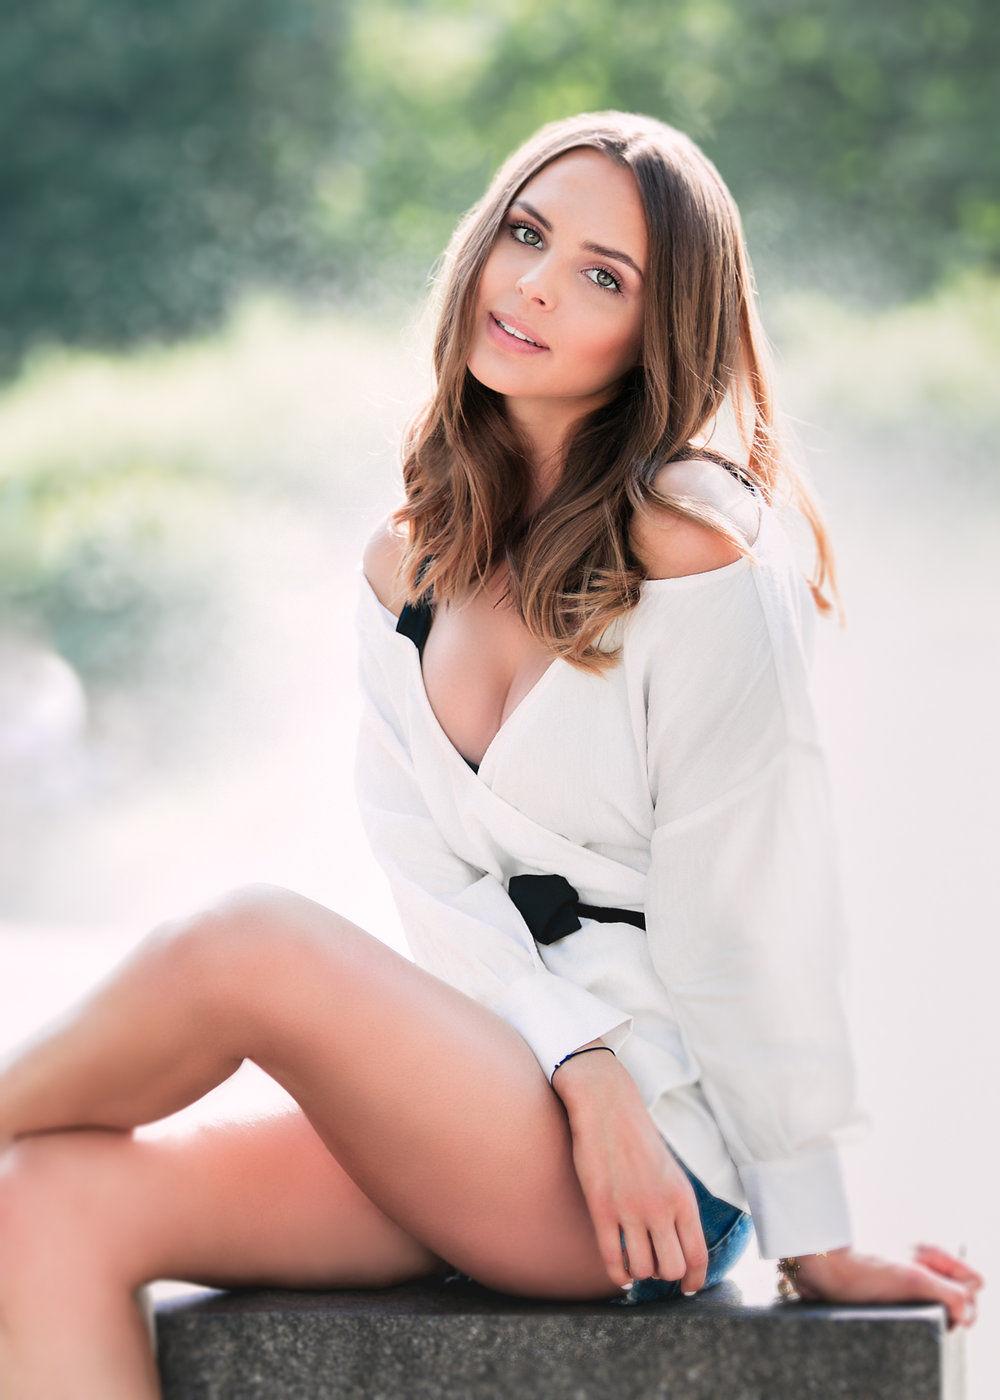 Magda-9922-Edit.jpg